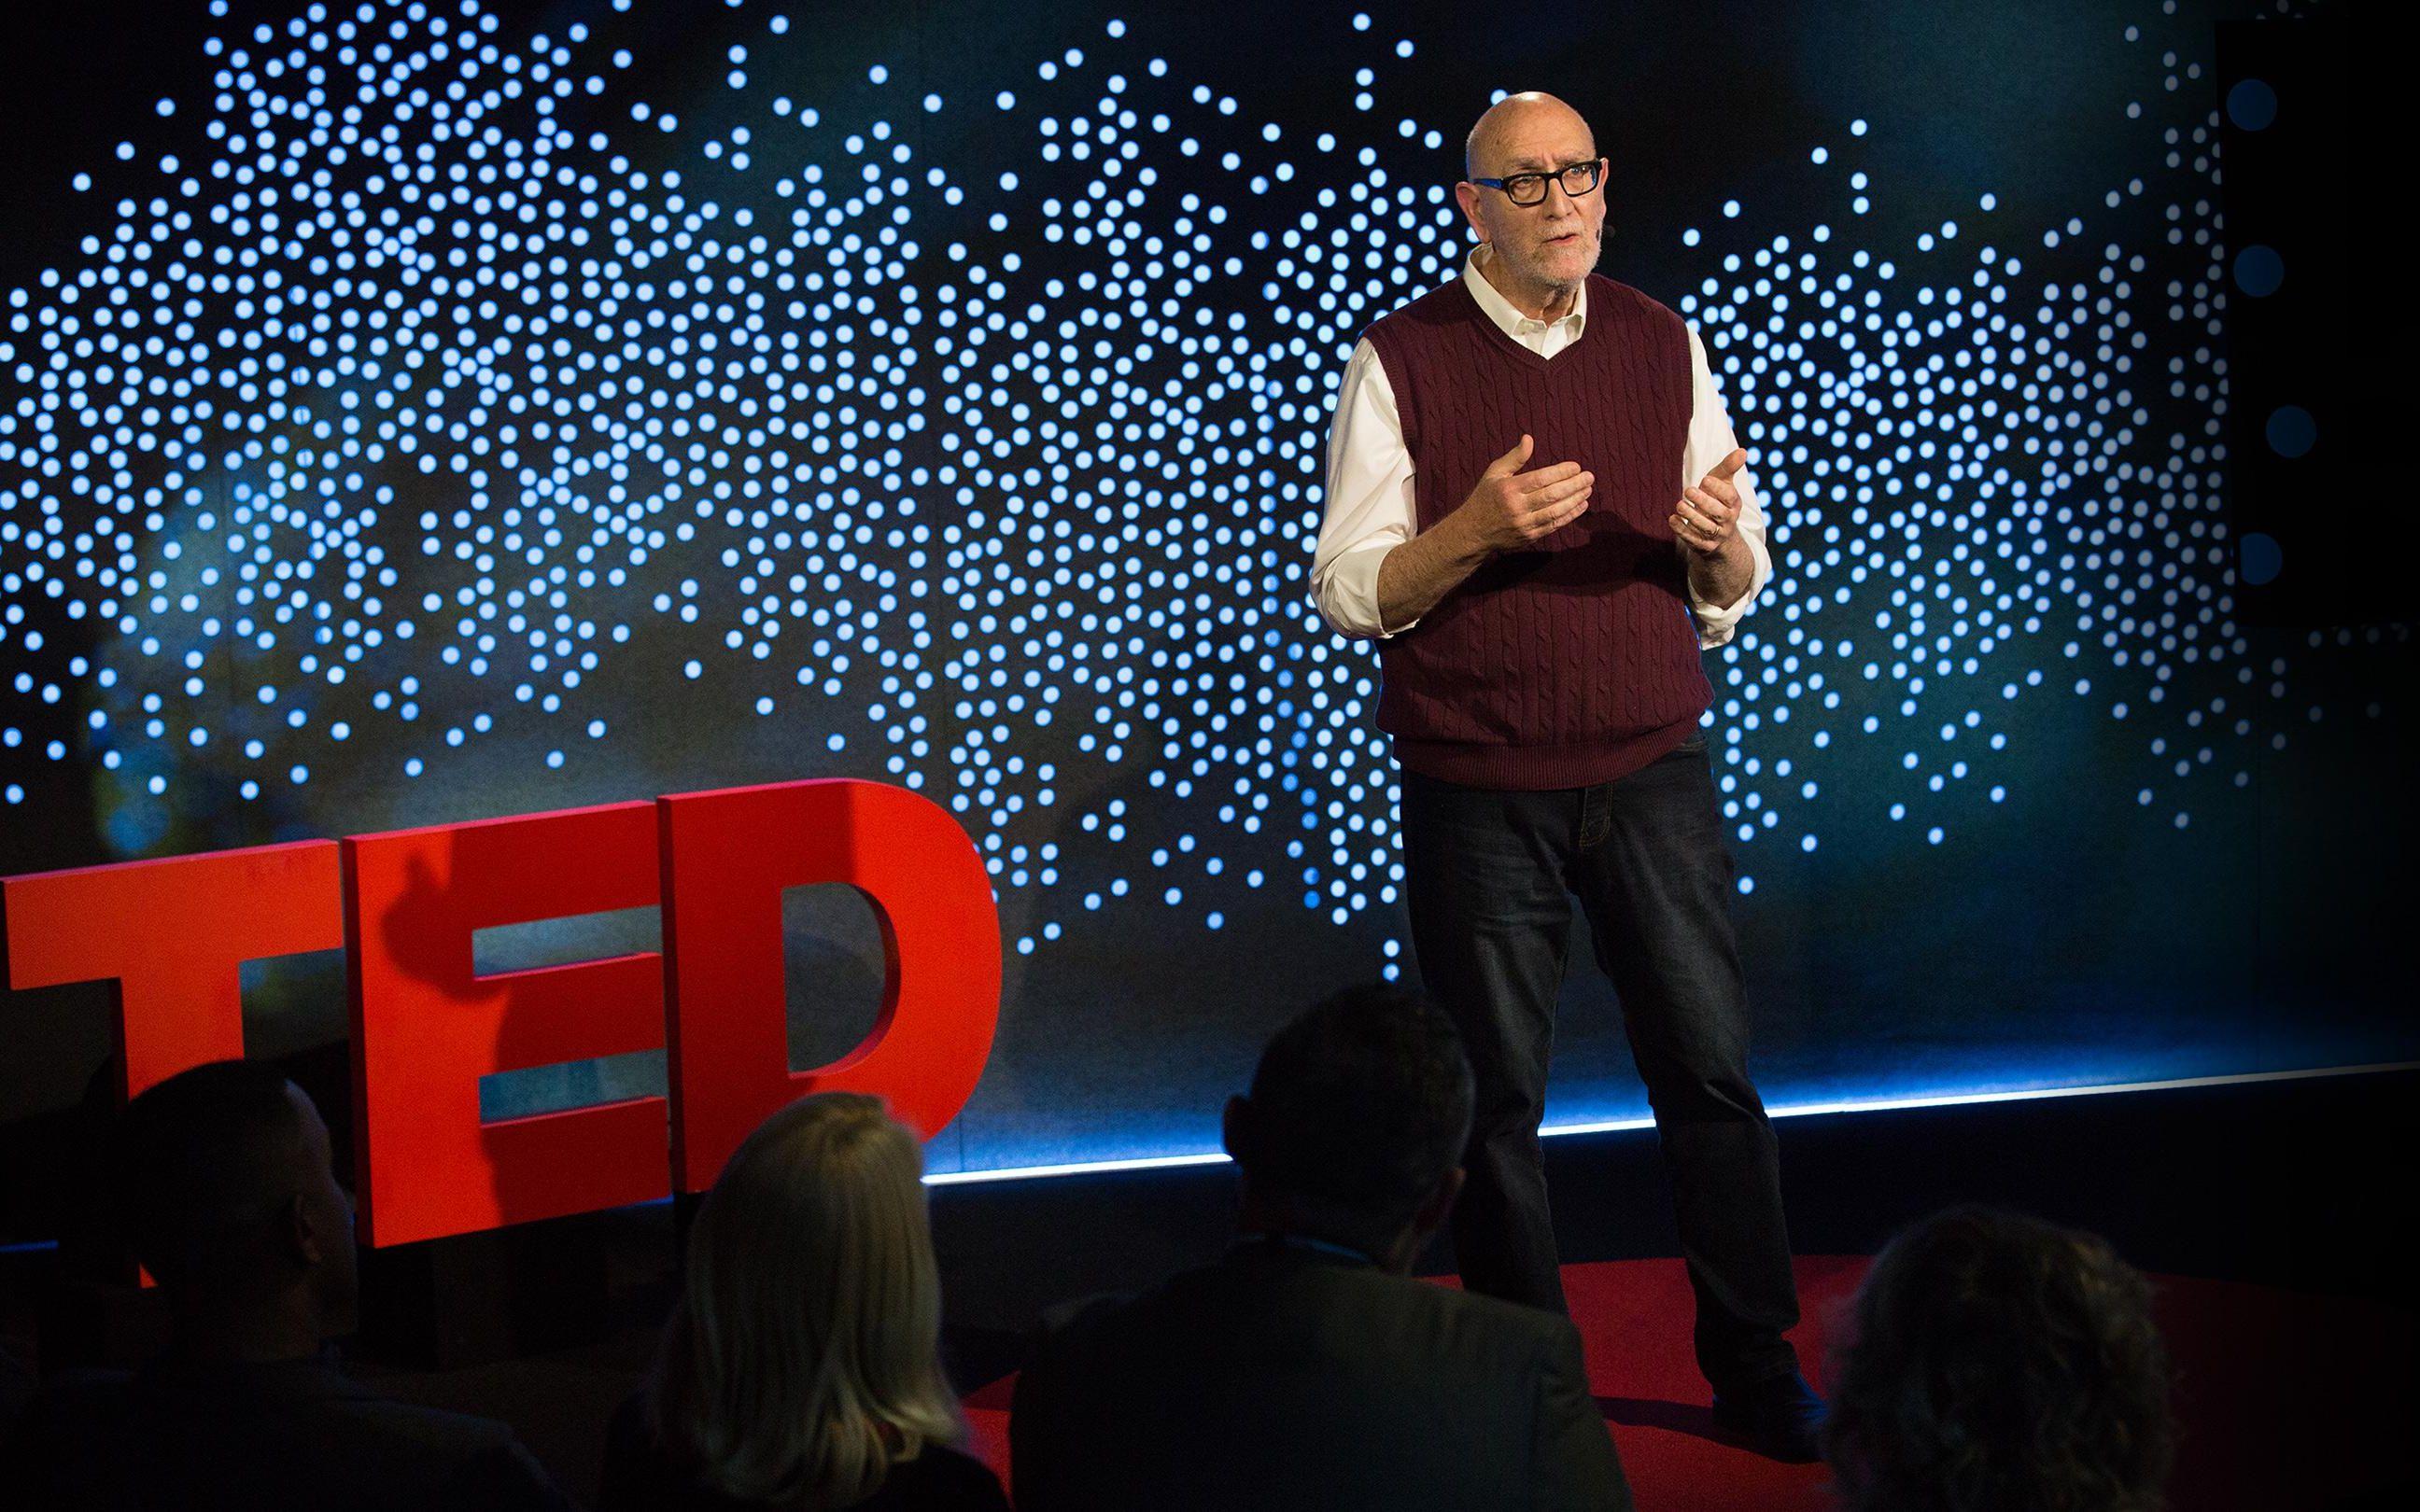 【TED 演講視頻】我如何在66歲成為了一個企業家_嗶哩嗶哩 (゜-゜)つロ 干杯~-bilibili